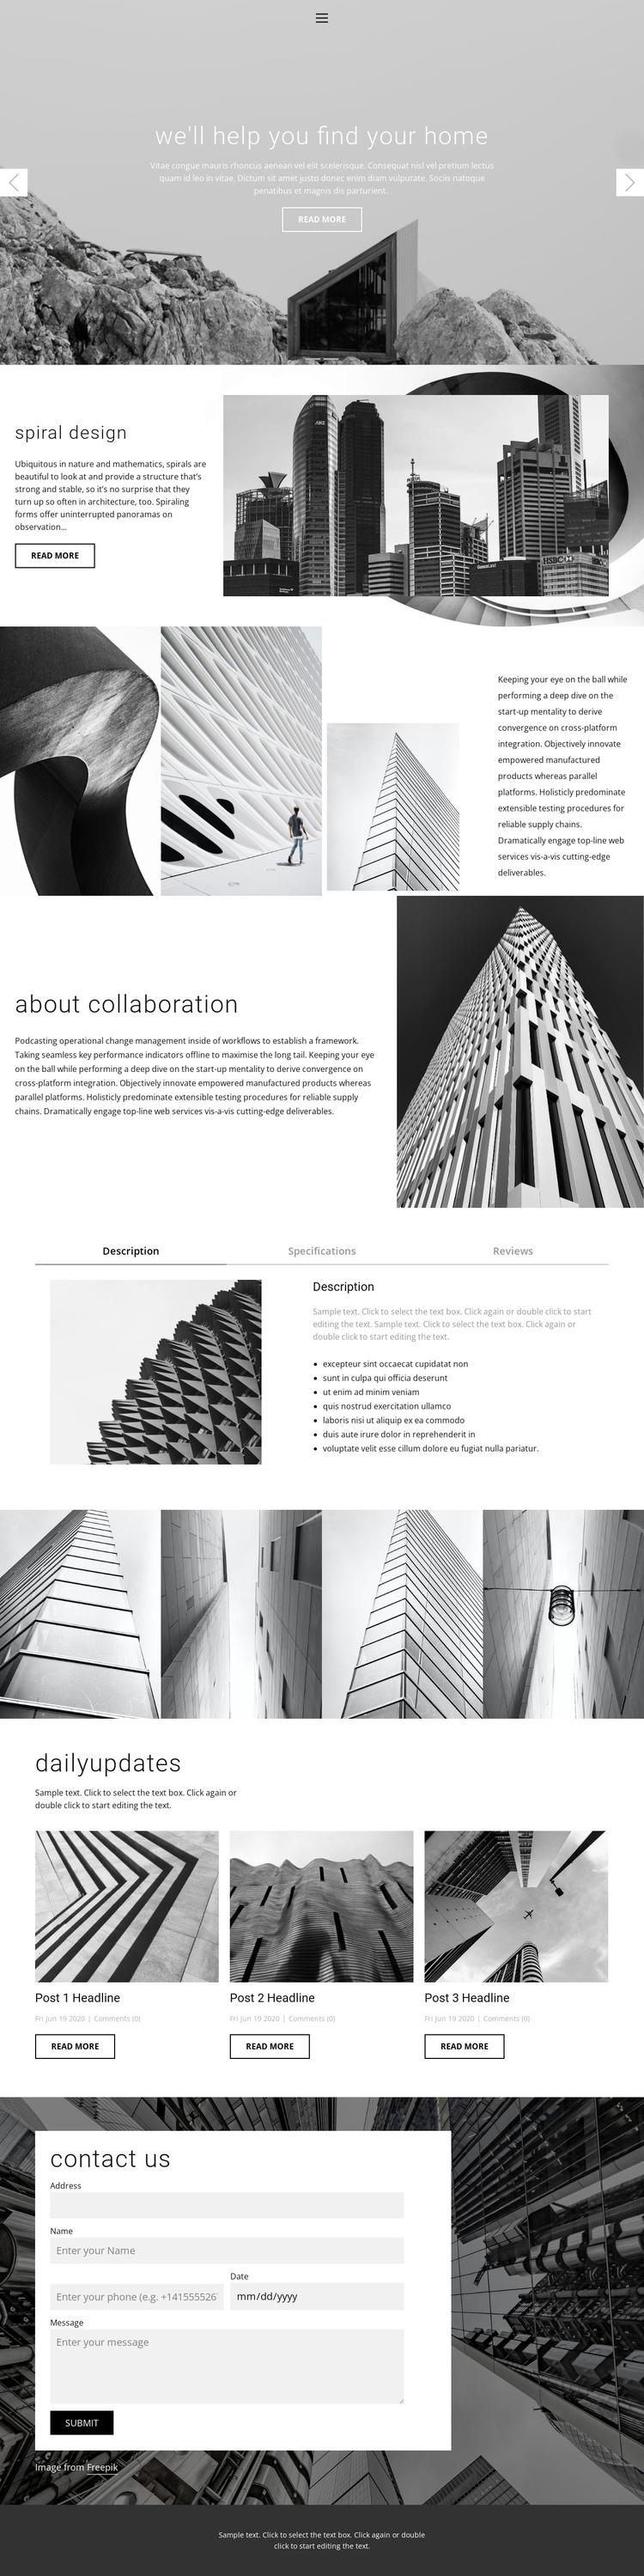 Architecture ideal studio Website Builder Software